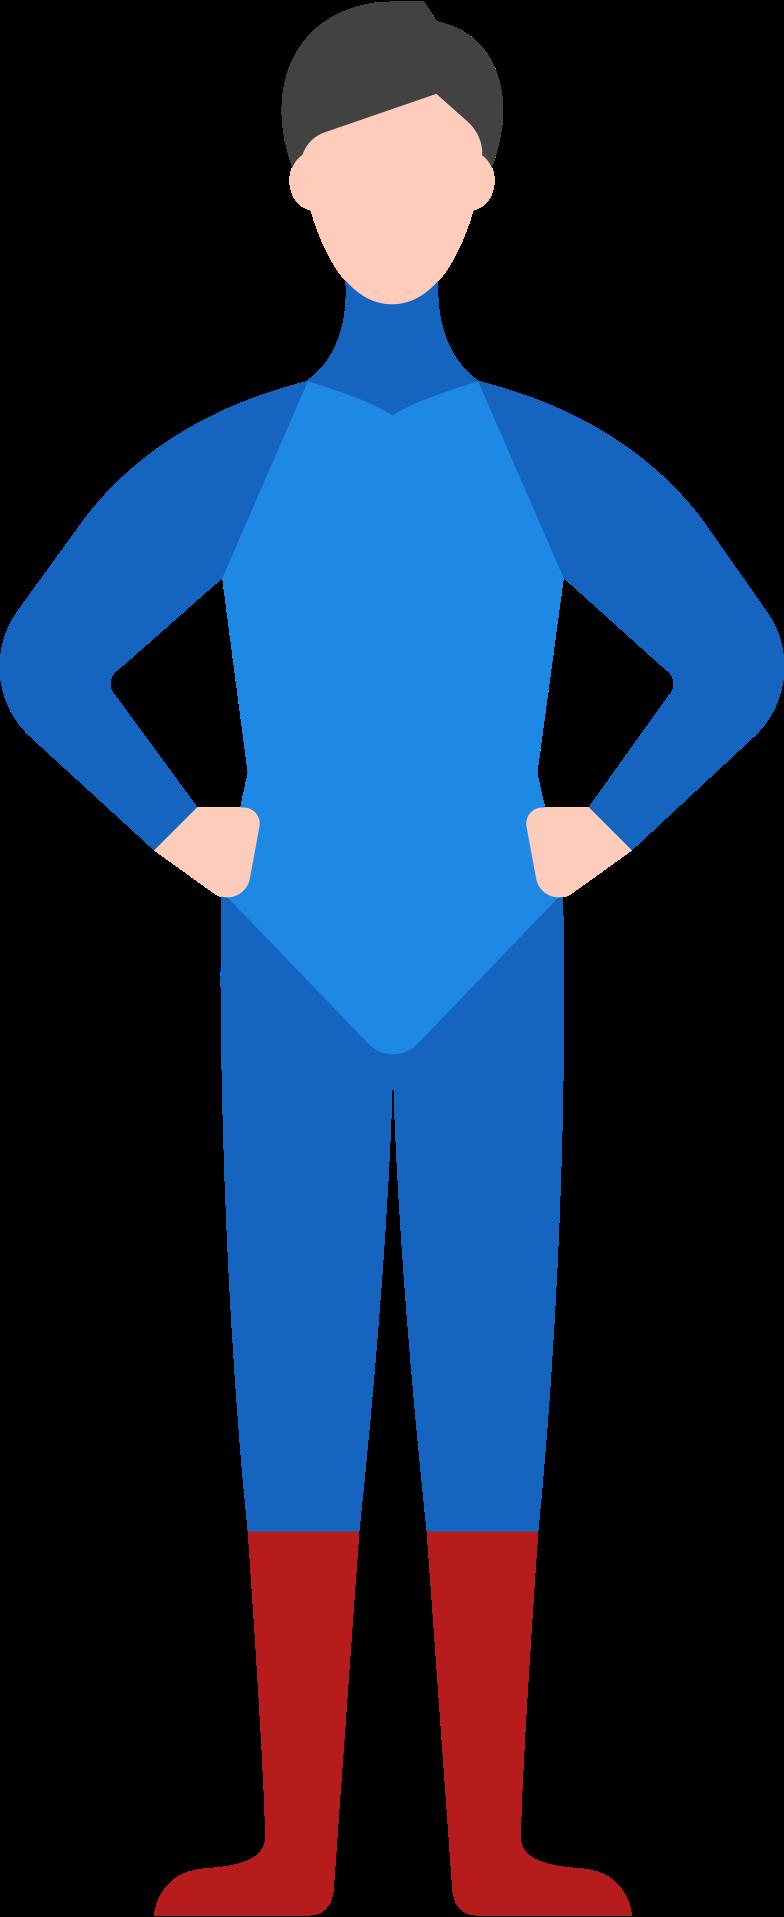 man superhero Clipart illustration in PNG, SVG